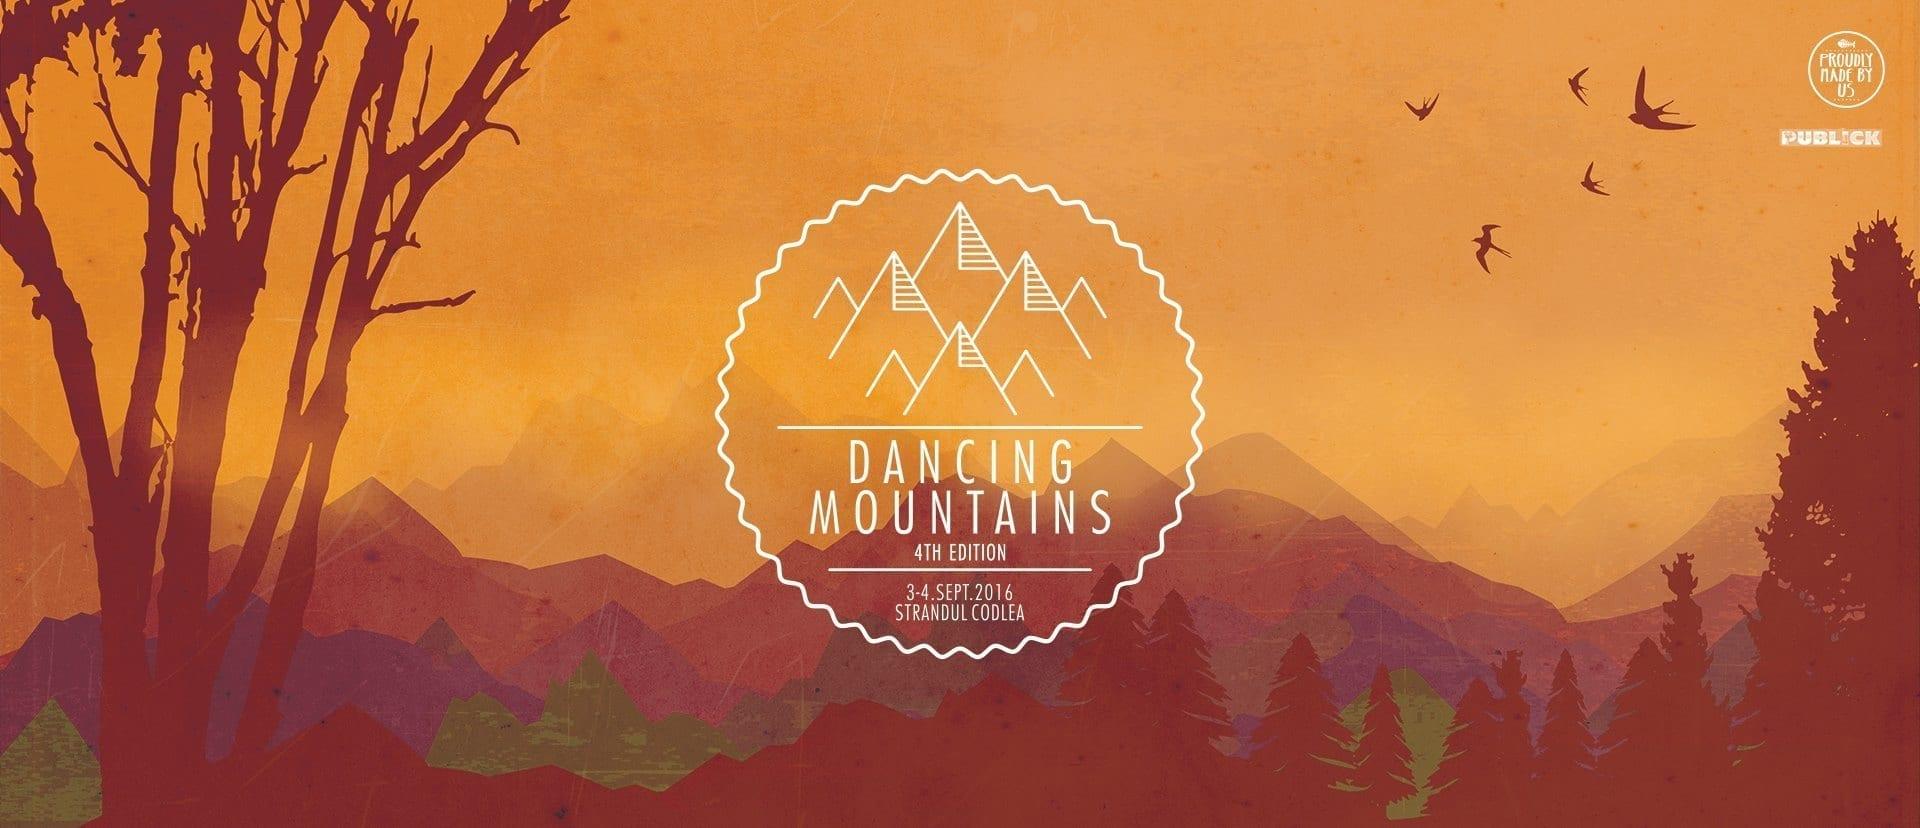 Dancing Mountains 4th edition @ Ștrandul Codlea